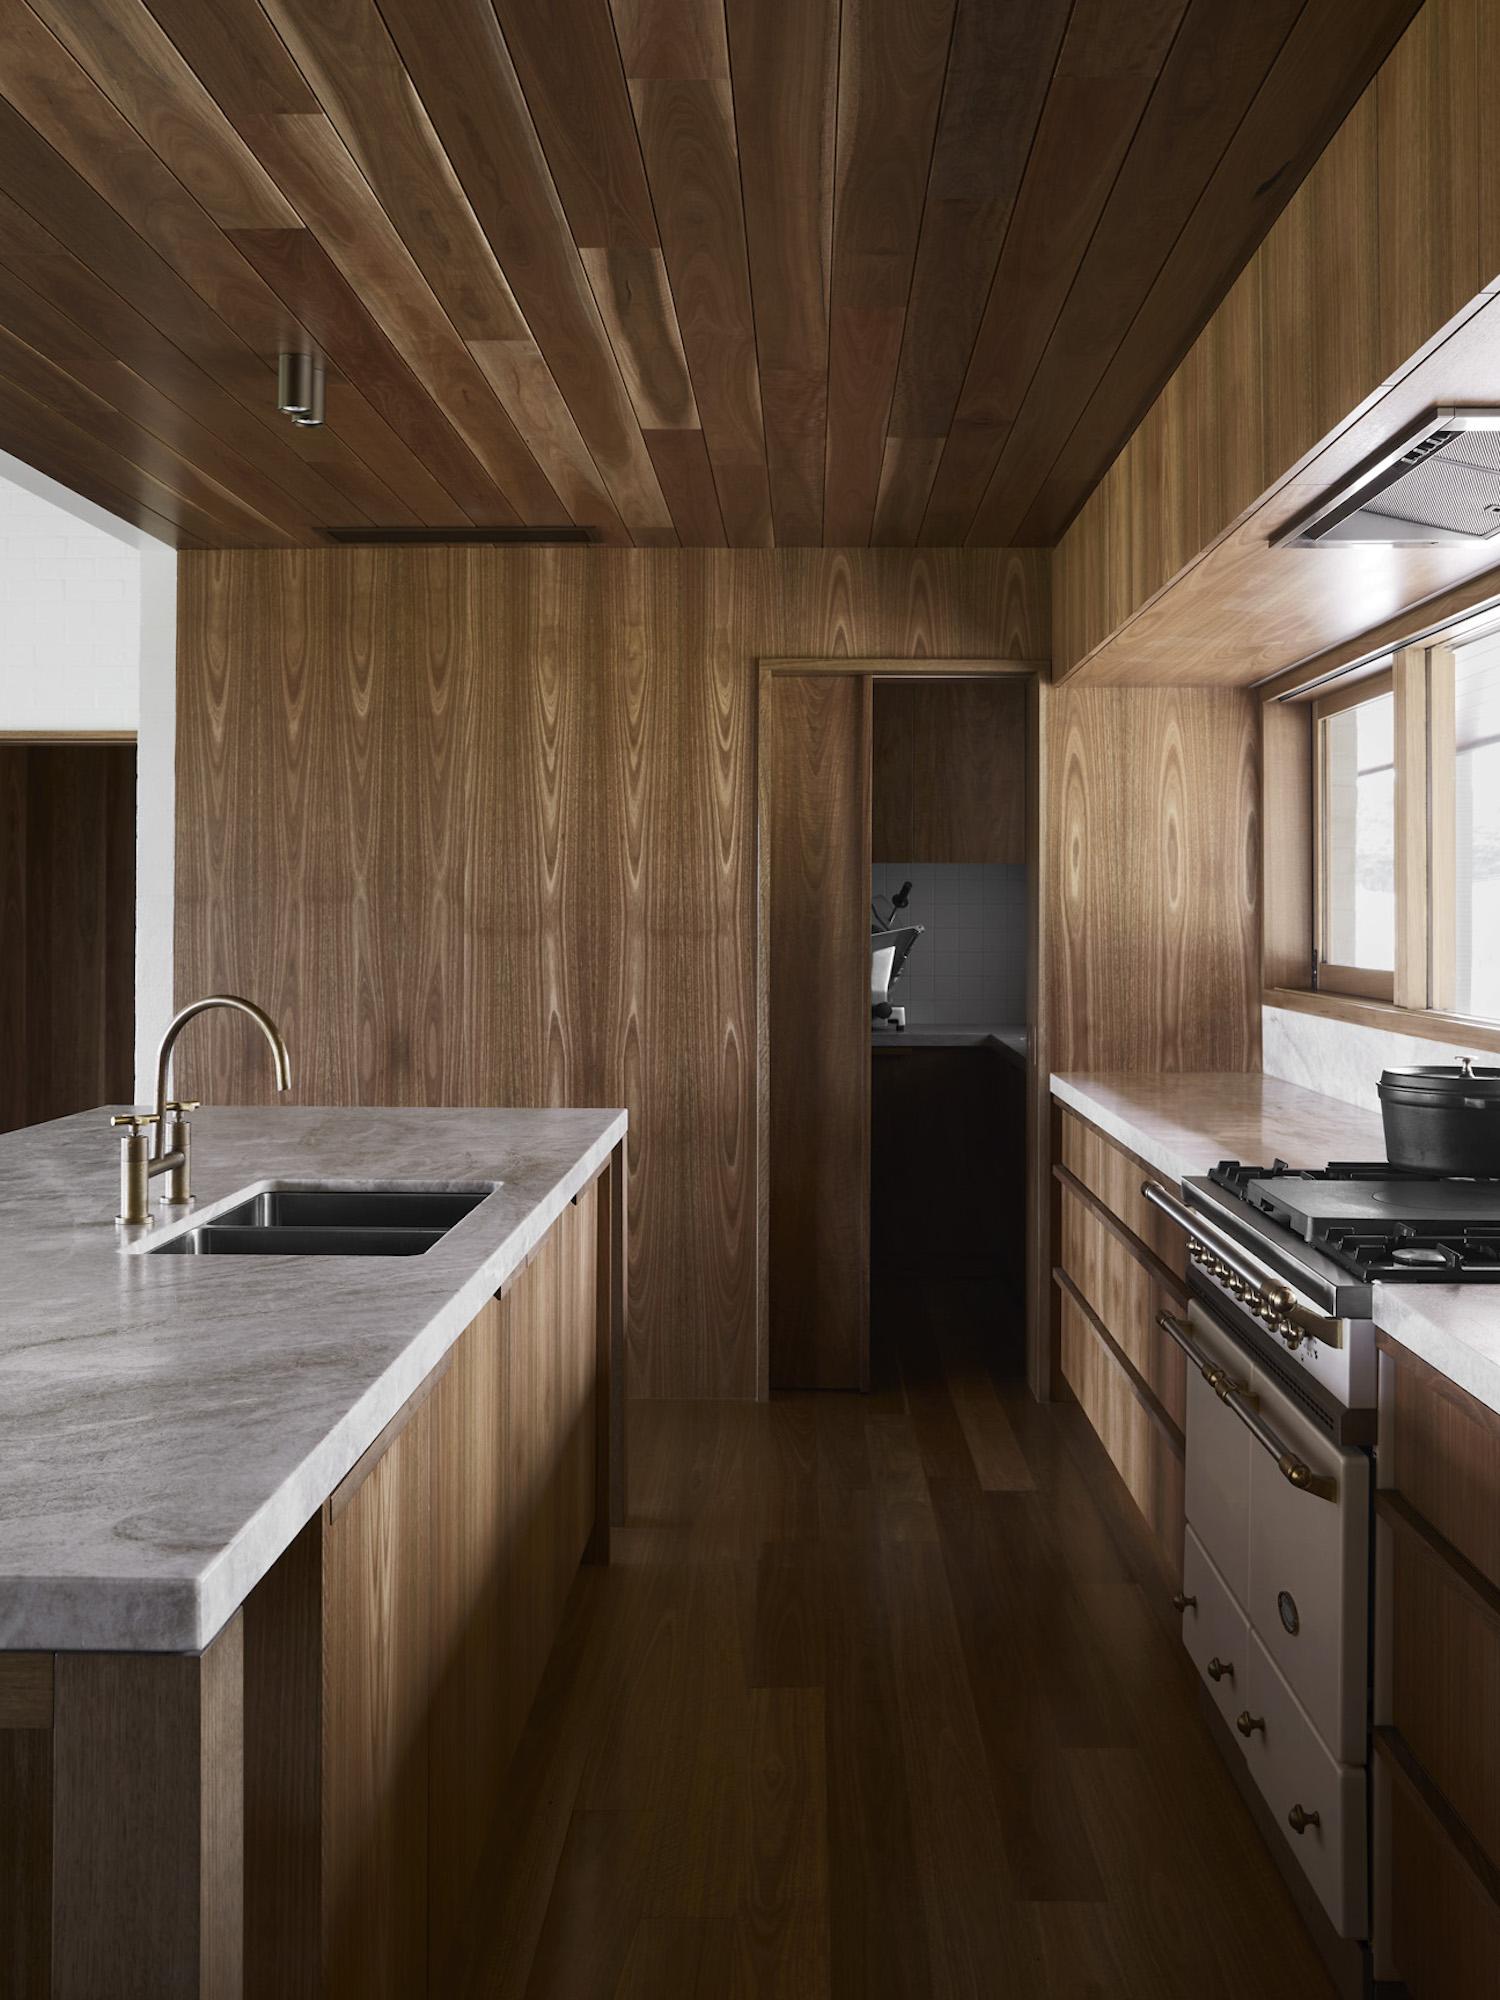 est living mornington peninsula house studio esteta 12